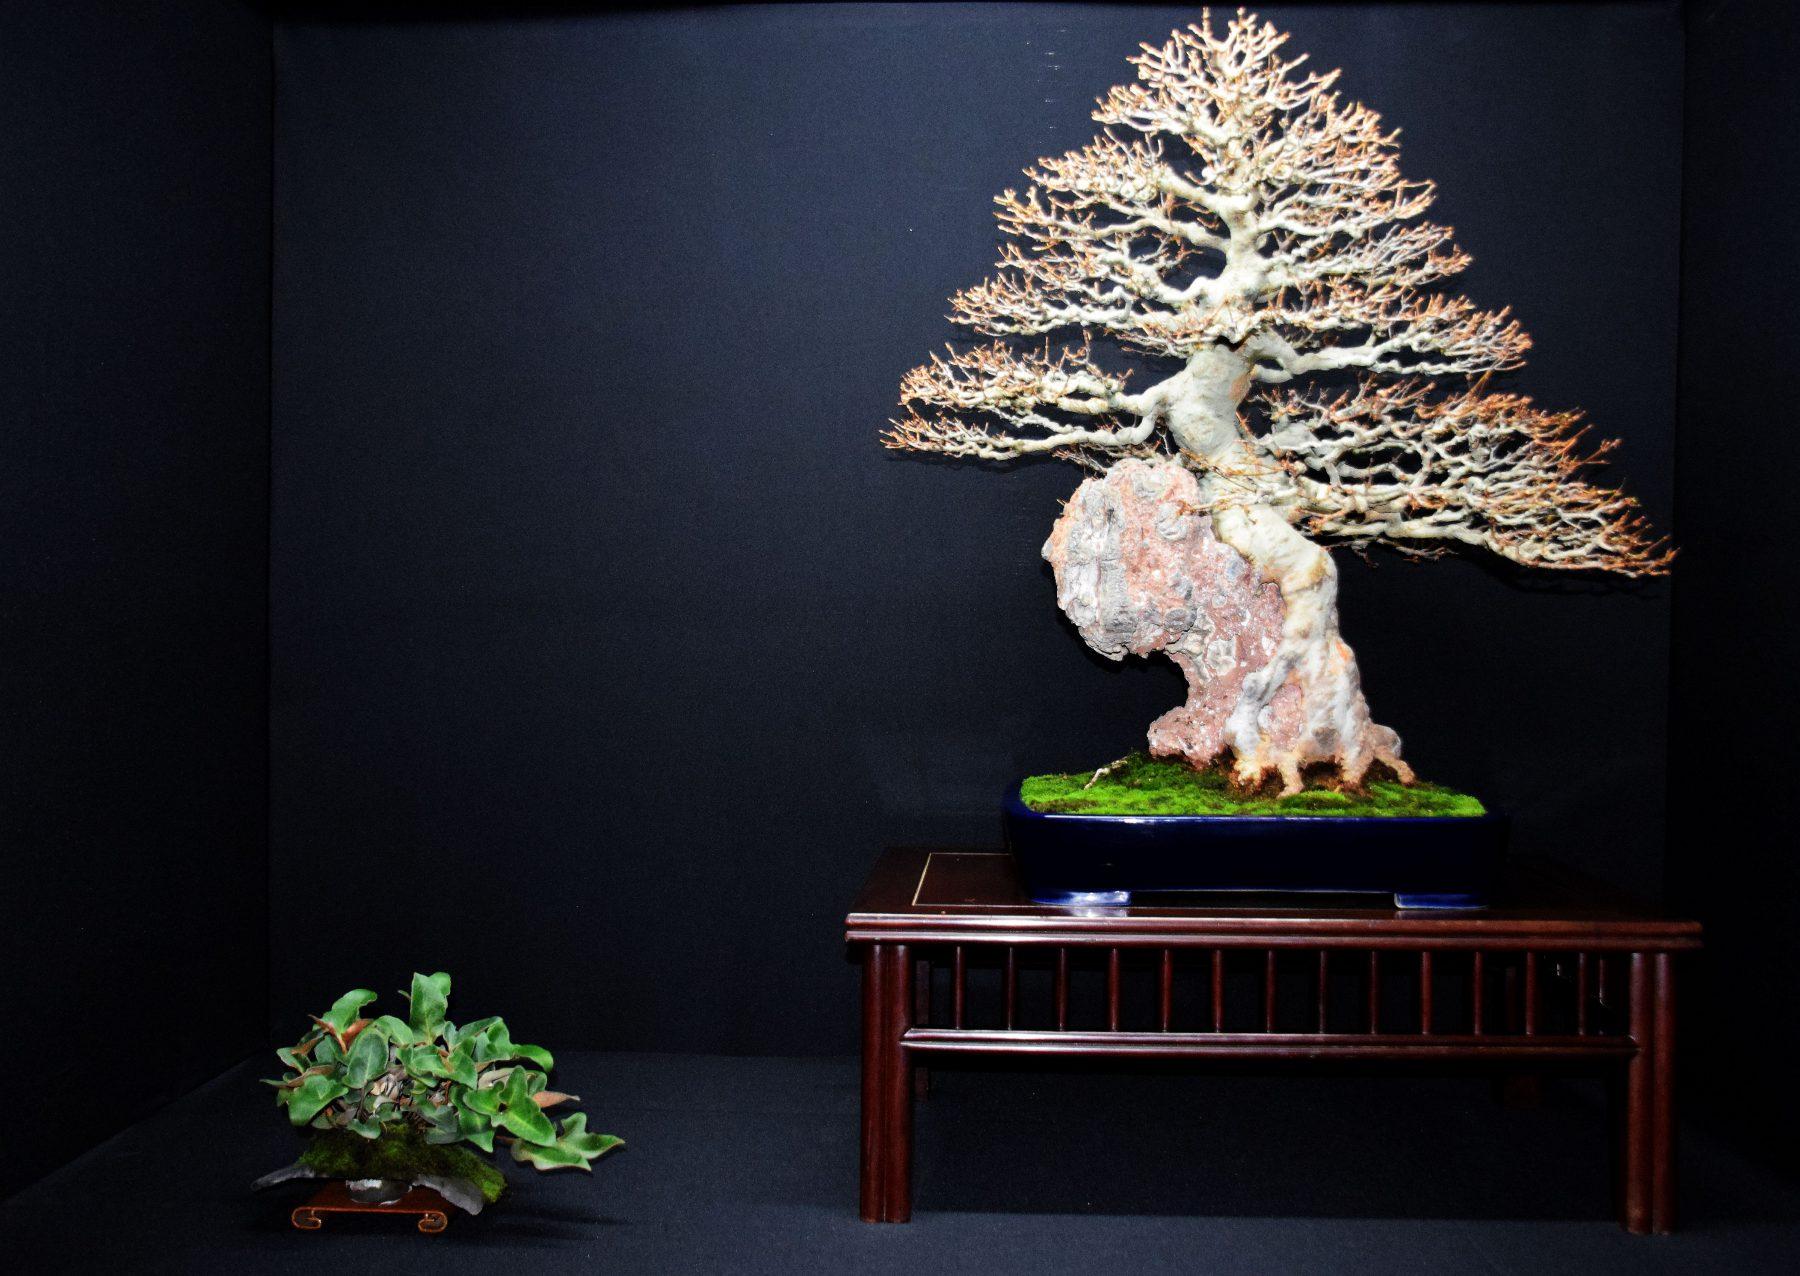 bonsai-museum-luis-vallejo-013